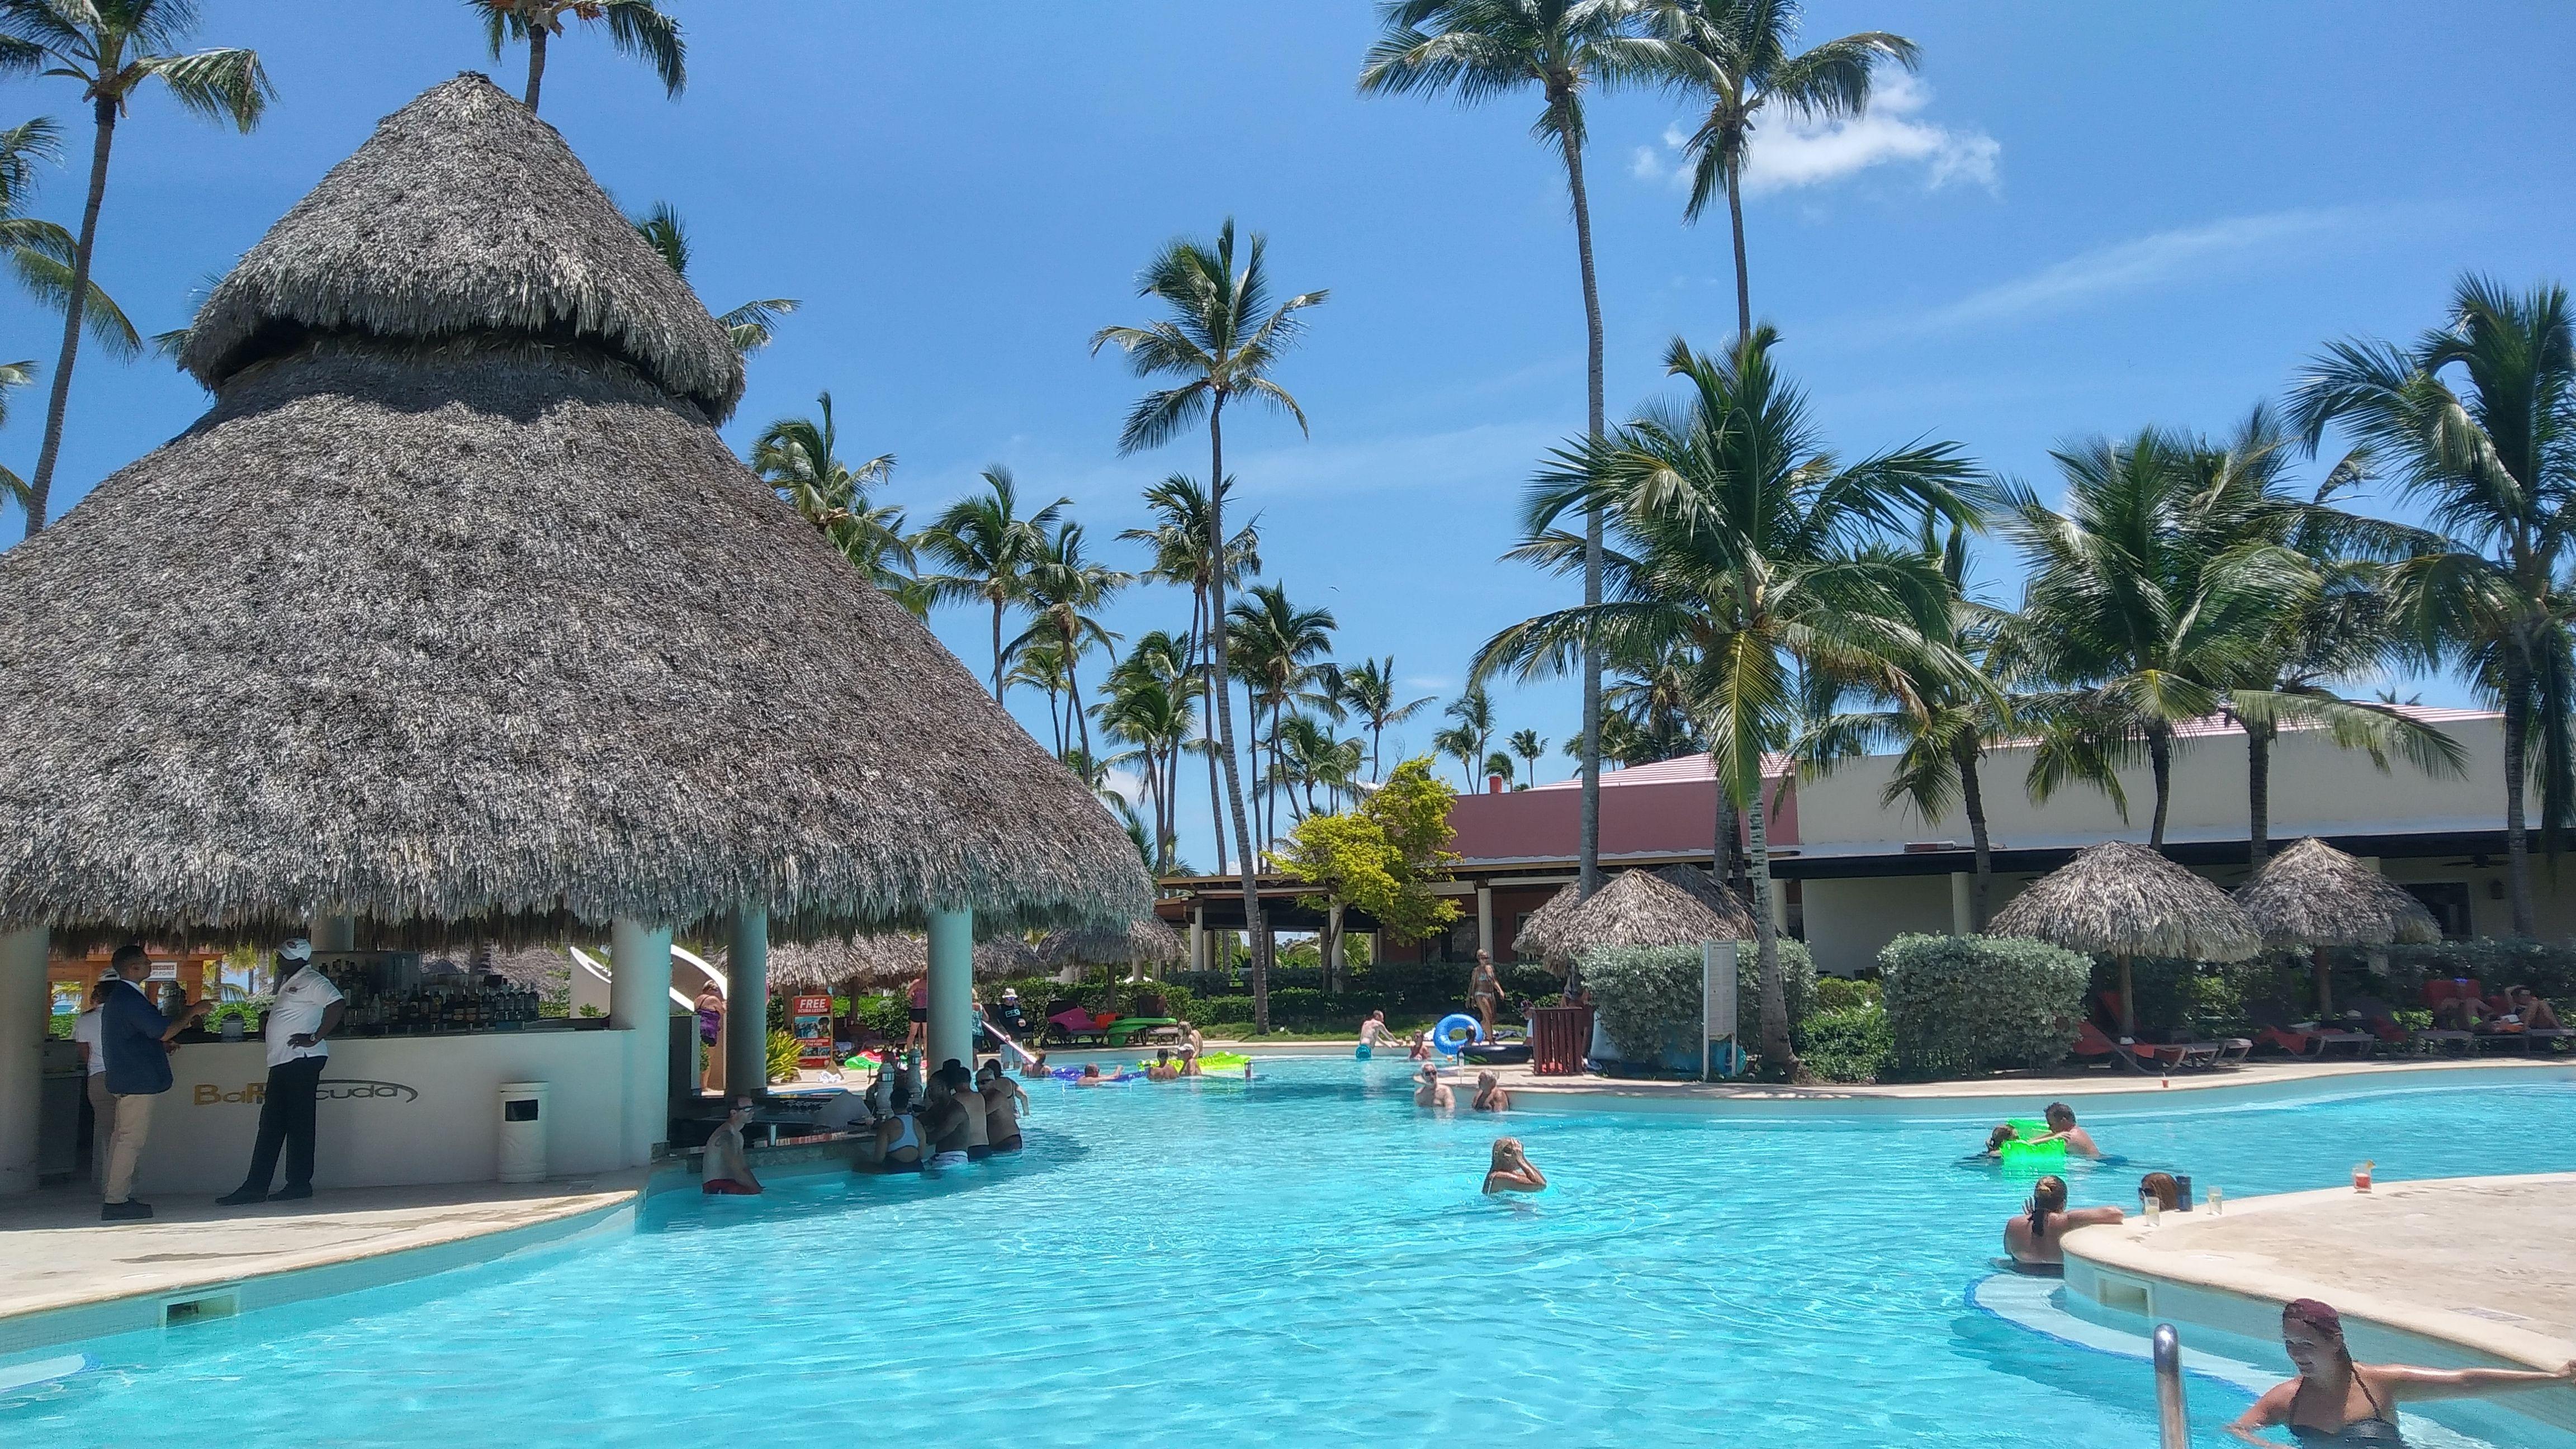 Blue paradise resort dominican republic